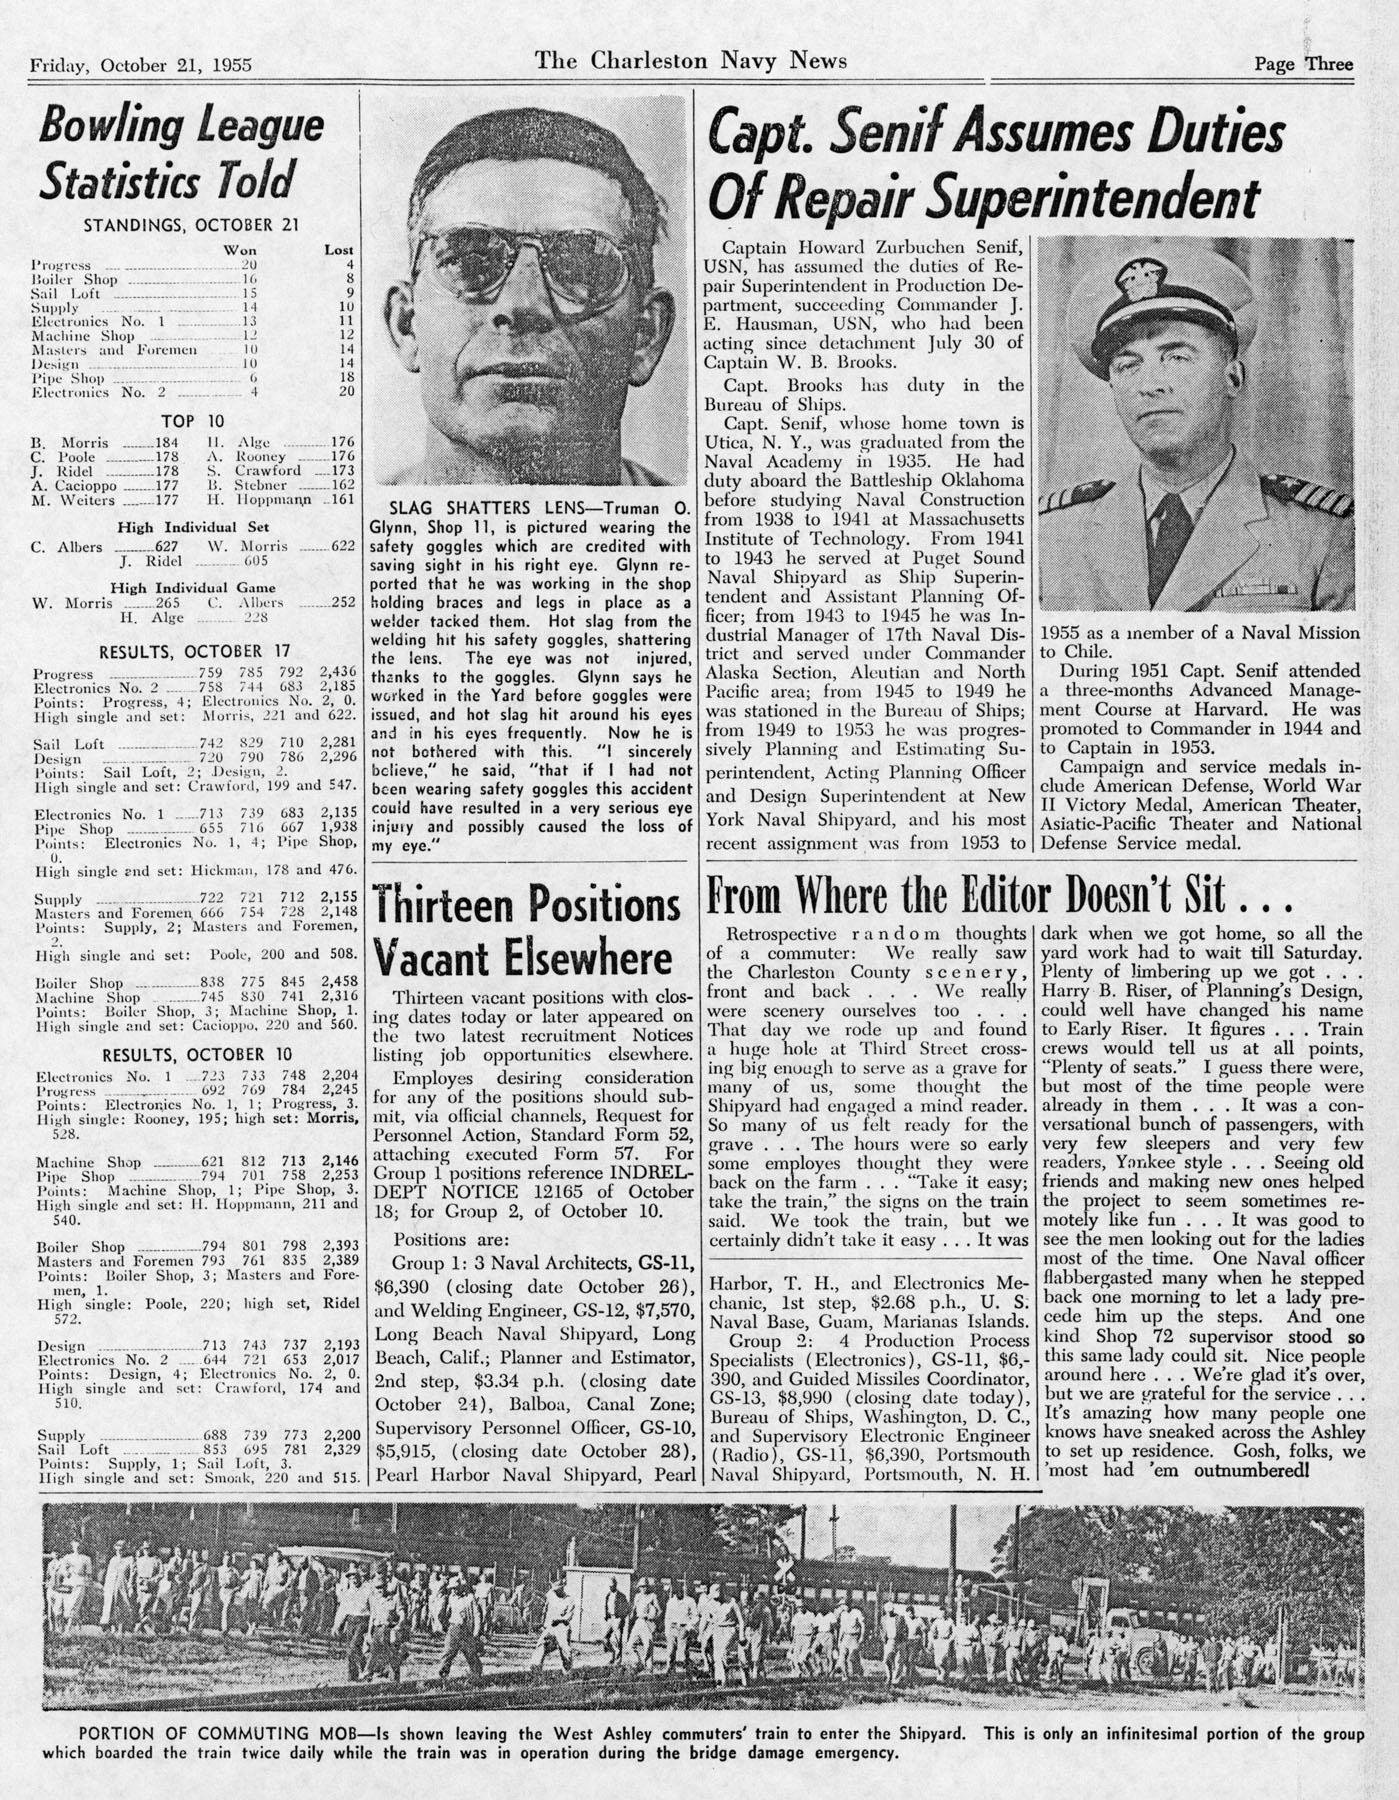 The Charleston Navy News, Volume 14, Edition 7, page iii